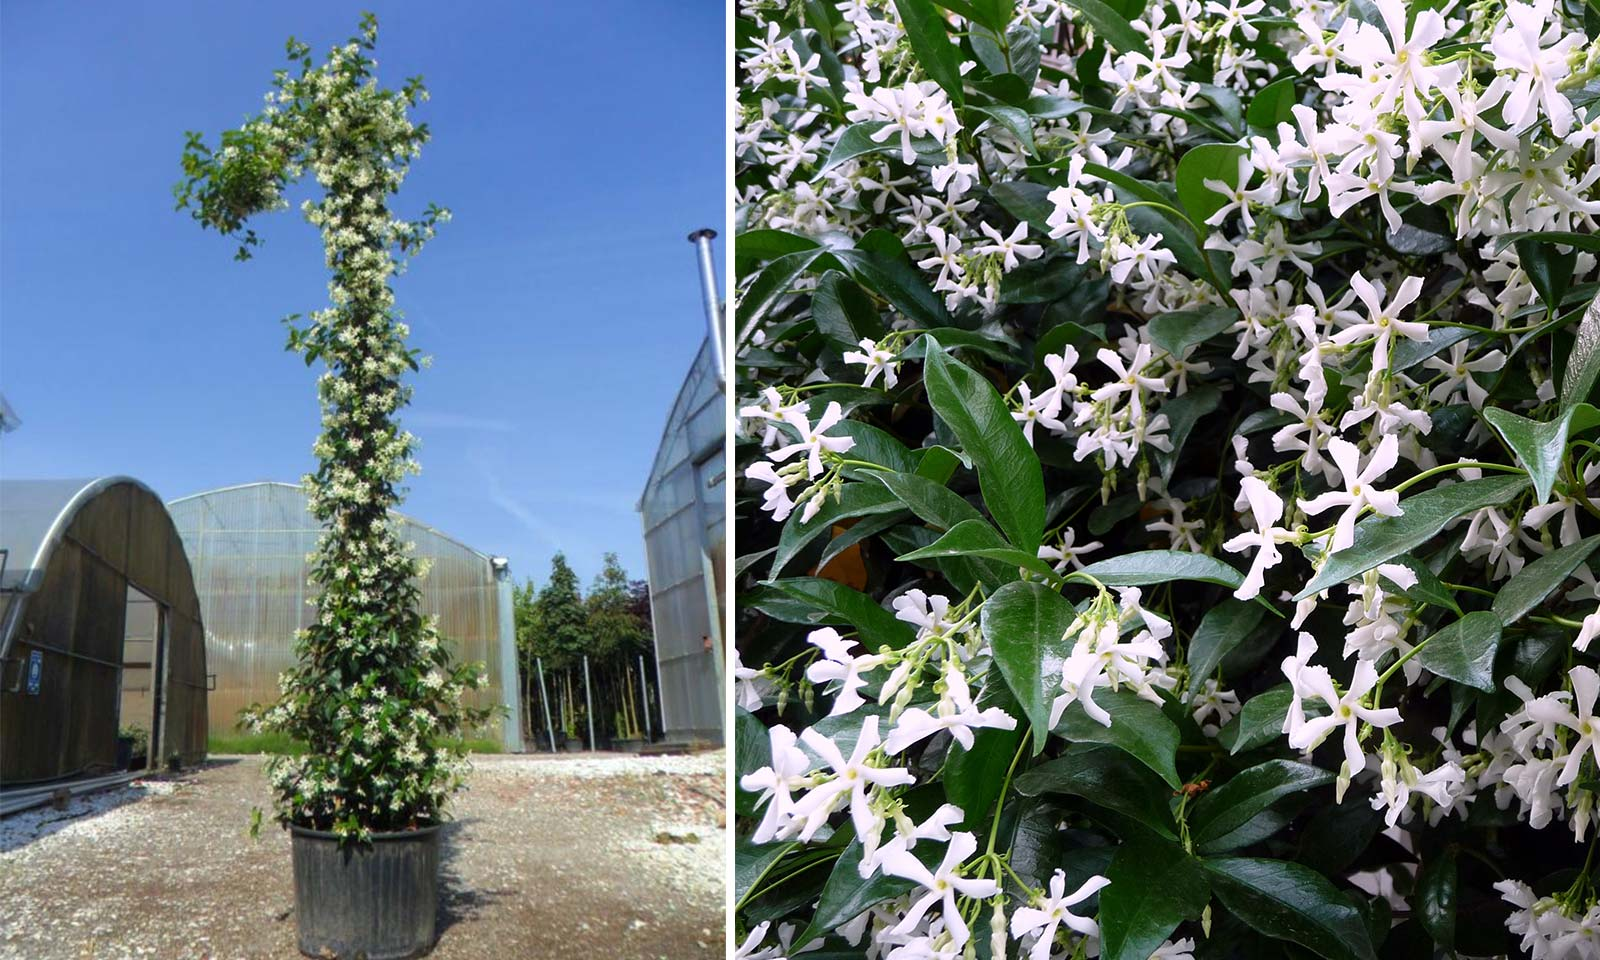 Rhyncospermum Jasminoides / Trachelospermum Jasminoides (Star Jasmine) – Climbing